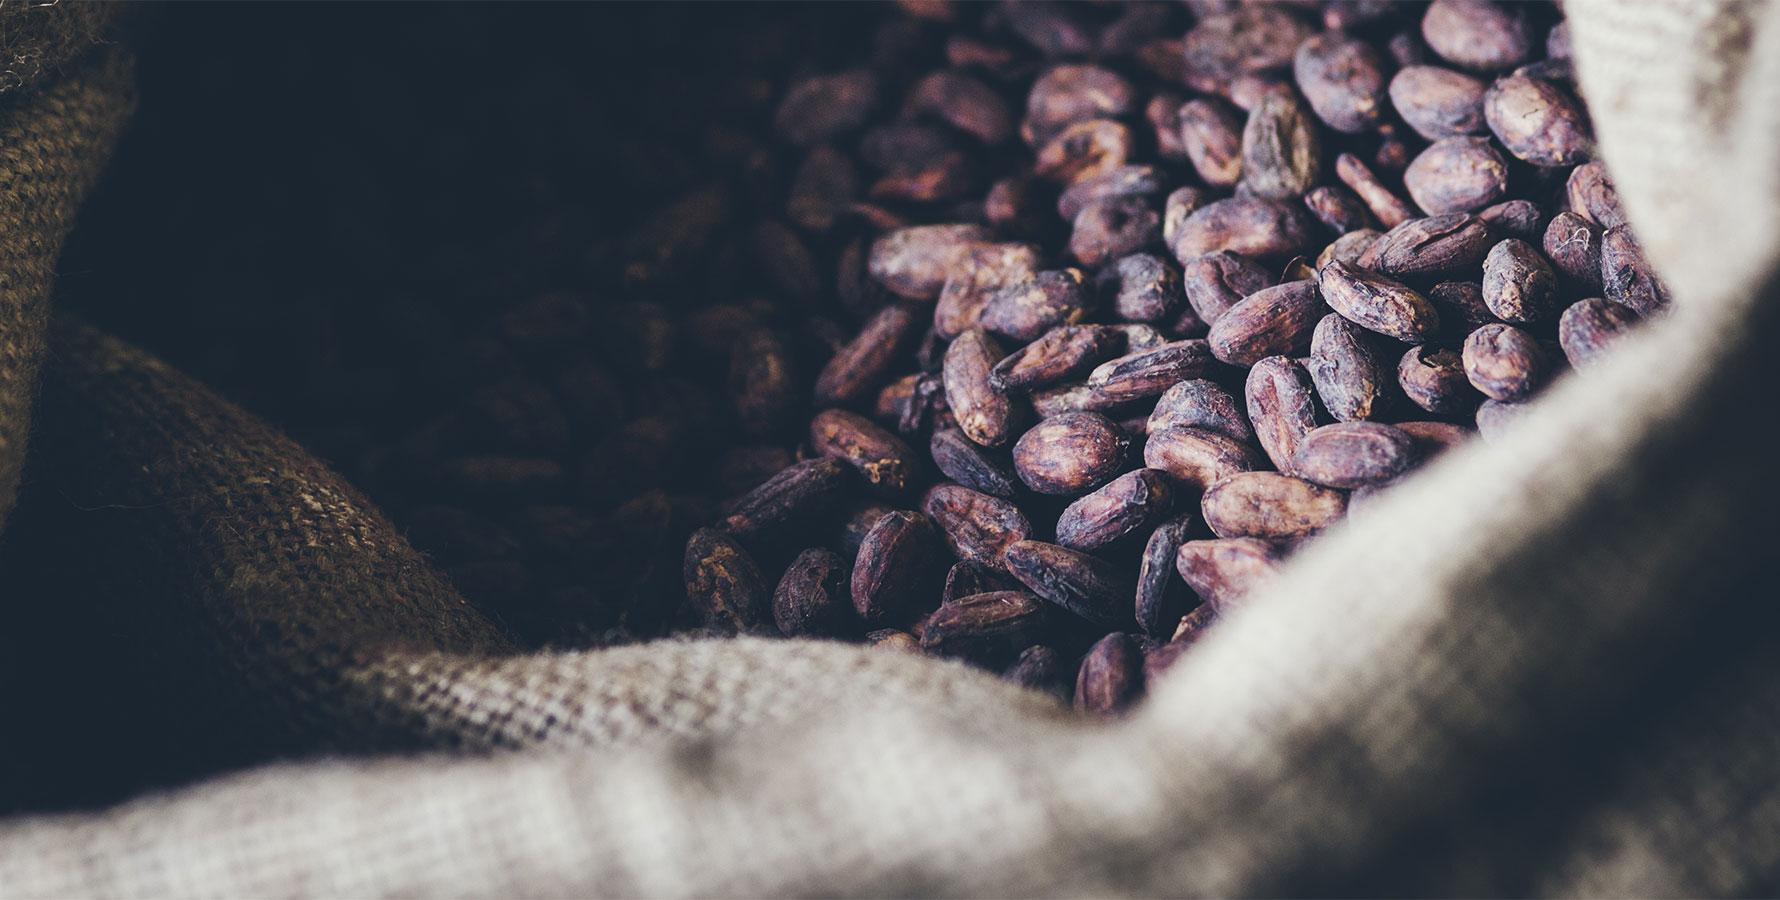 Laia chocolaterie Baigorry